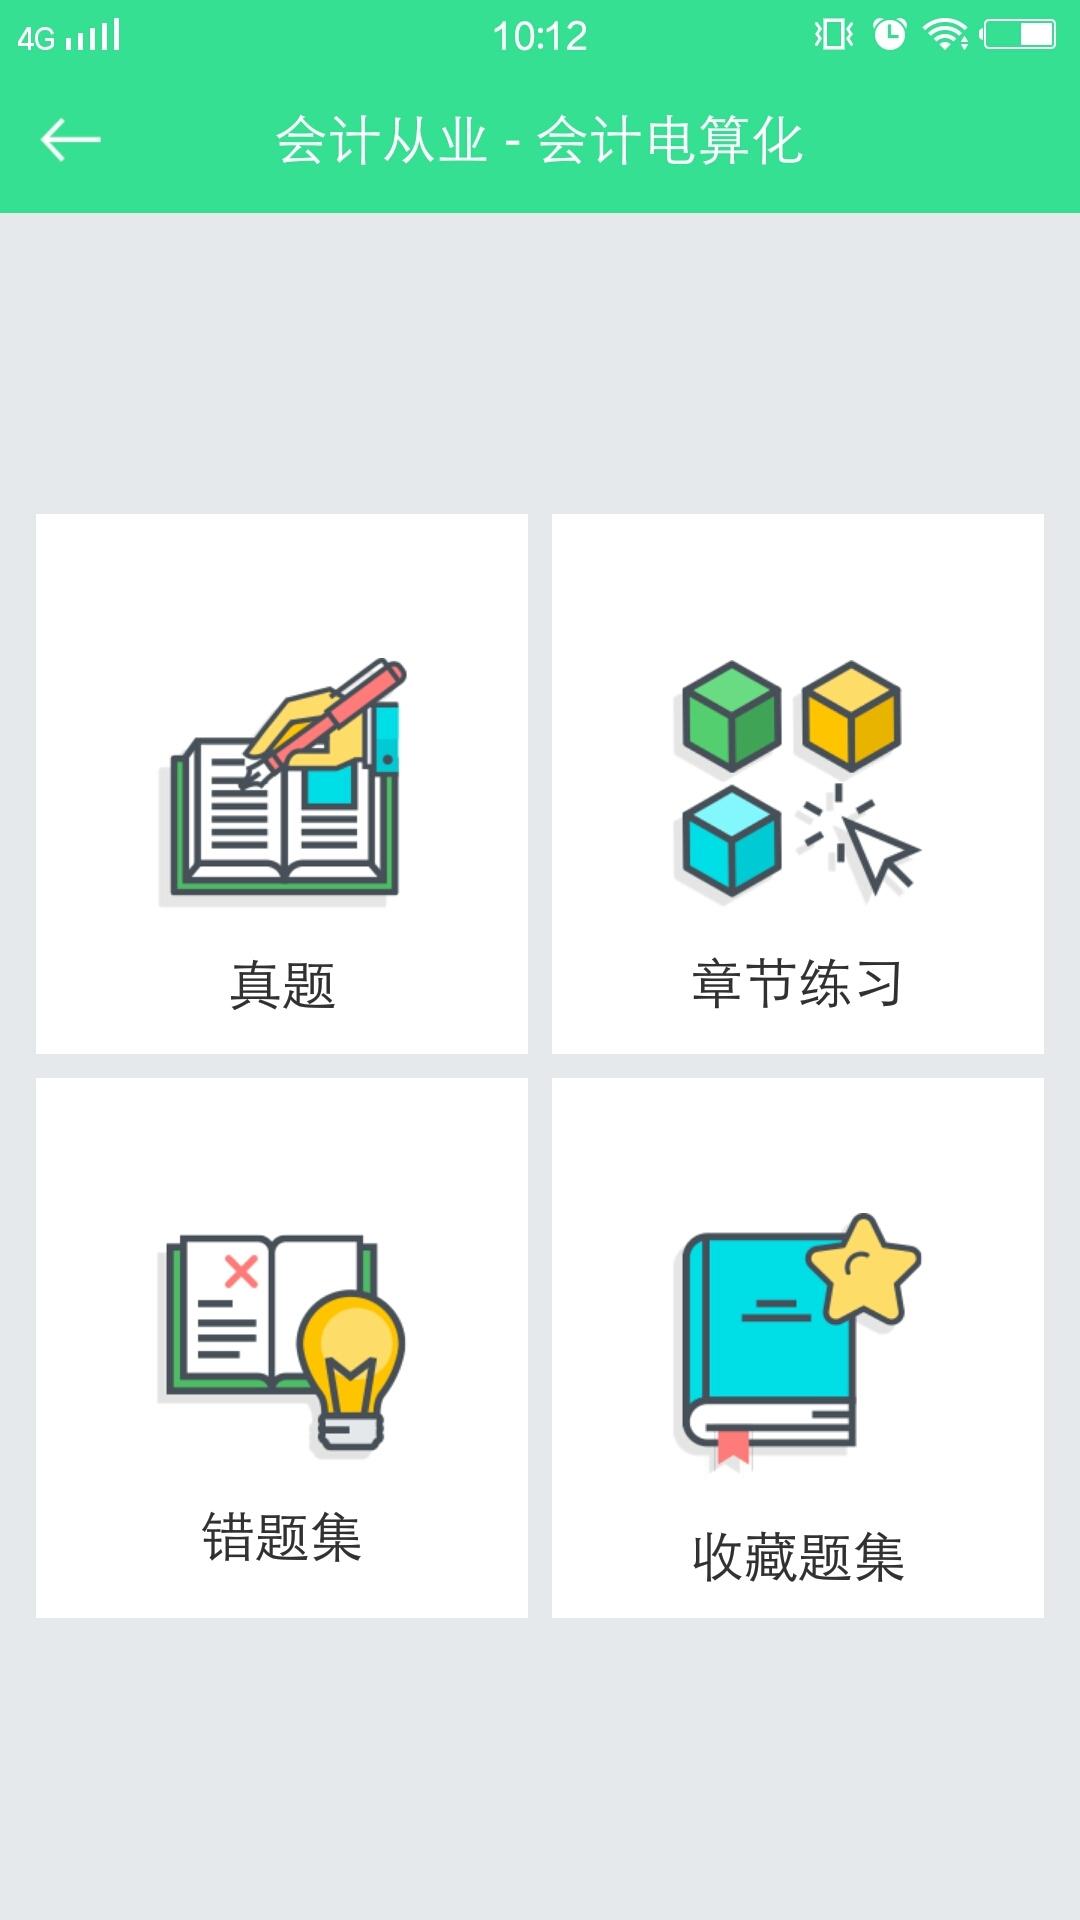 青书学堂 v17.4.1